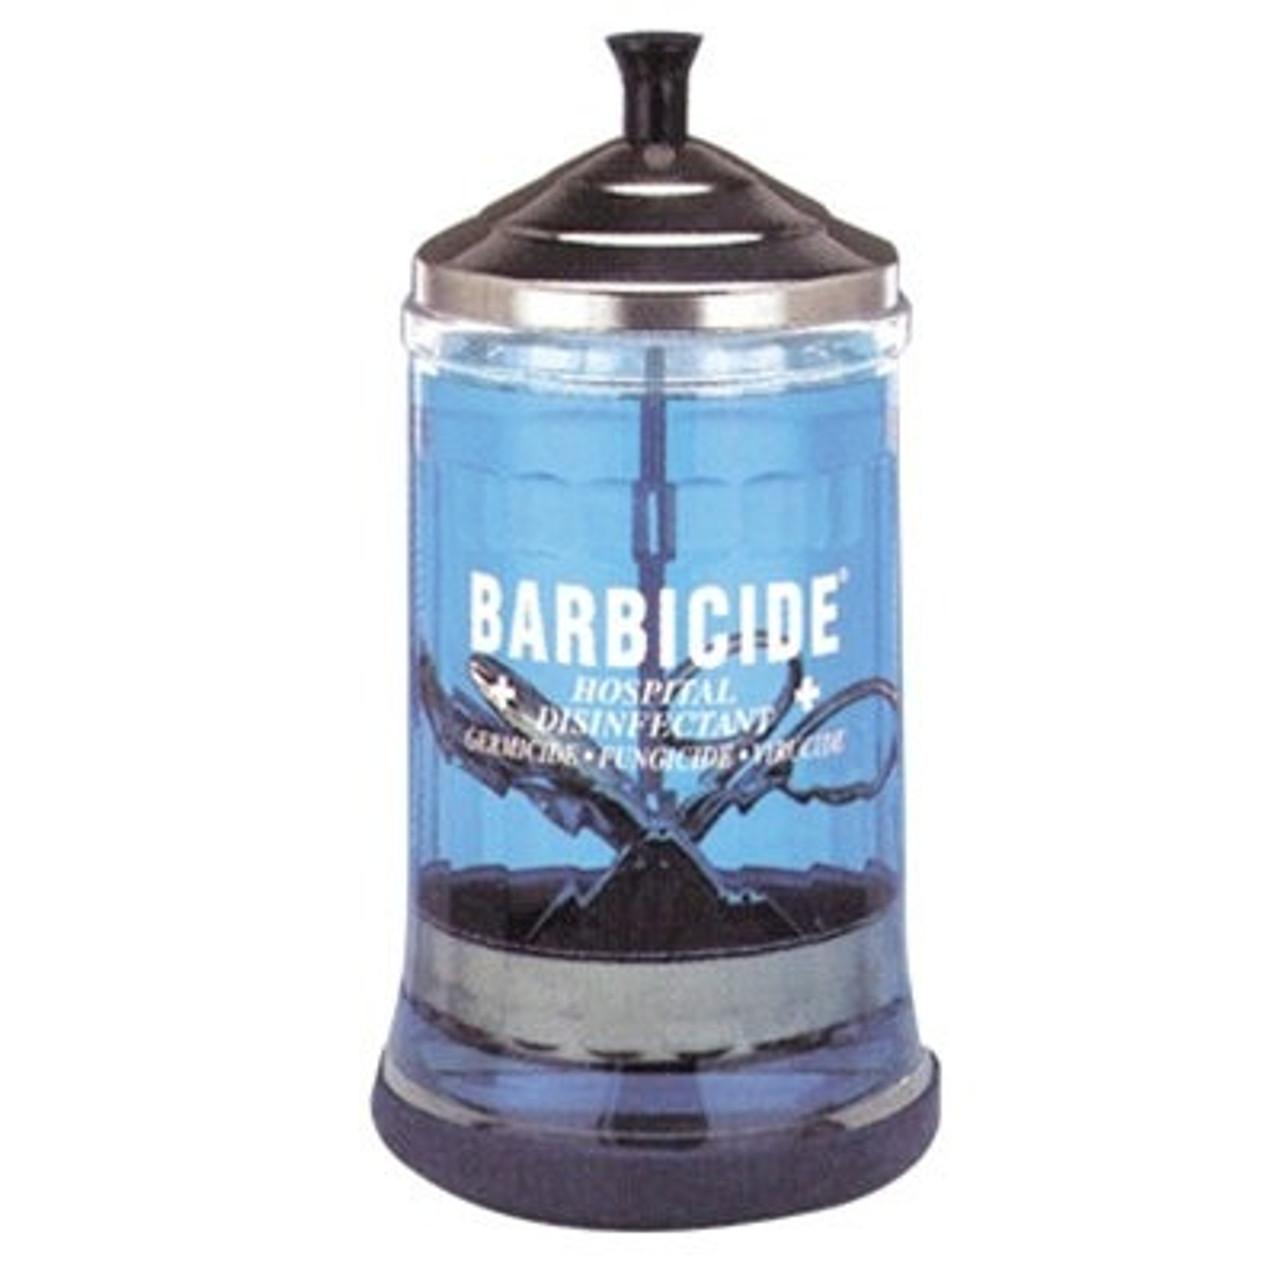 Barbicide Disinfectant Jar Midsize